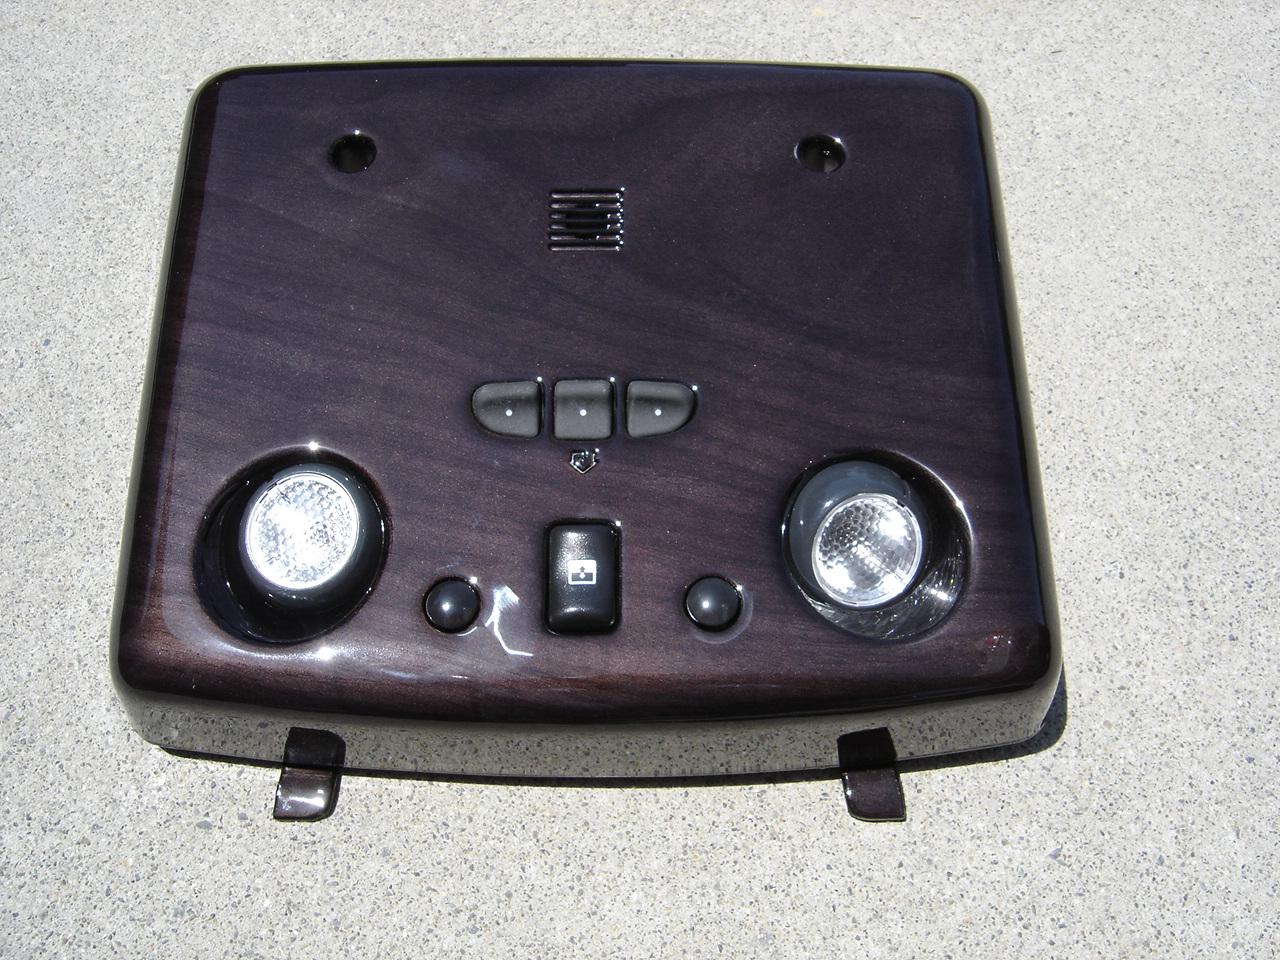 Hummerdashcom Hummer H2 Fuse Box Location Overhead Console Custom Interior Carbon Fiber Wood